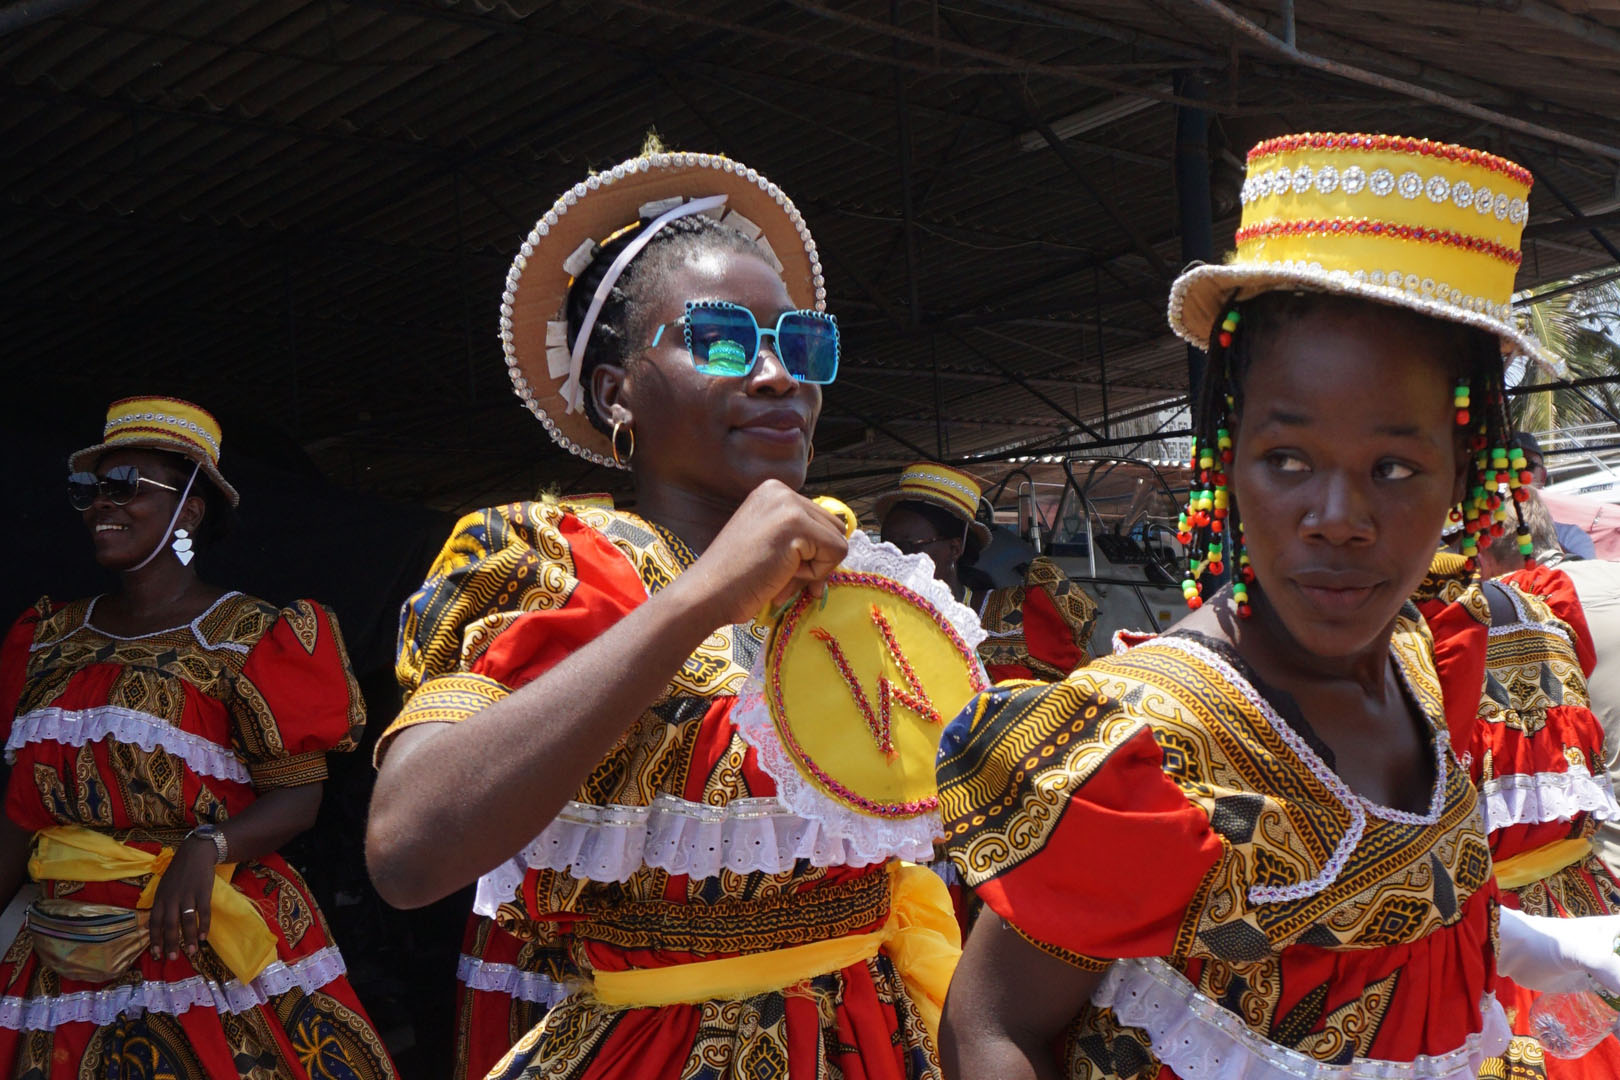 Carnival in Luanda, Angola